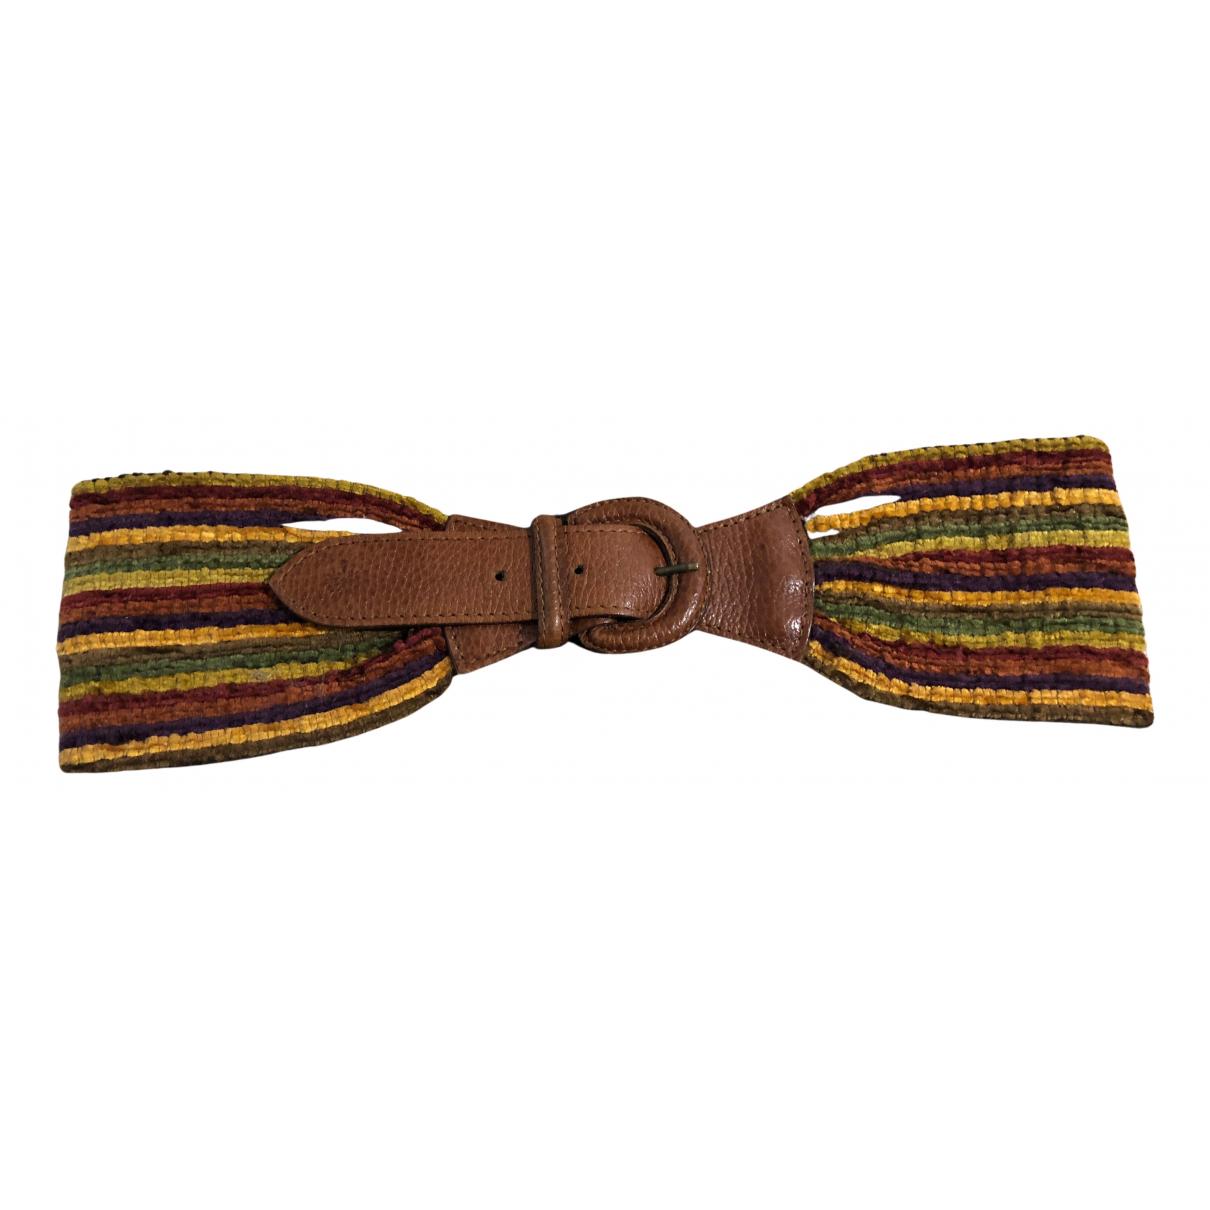 Mulberry N Multicolour Cloth belt for Women 70 cm